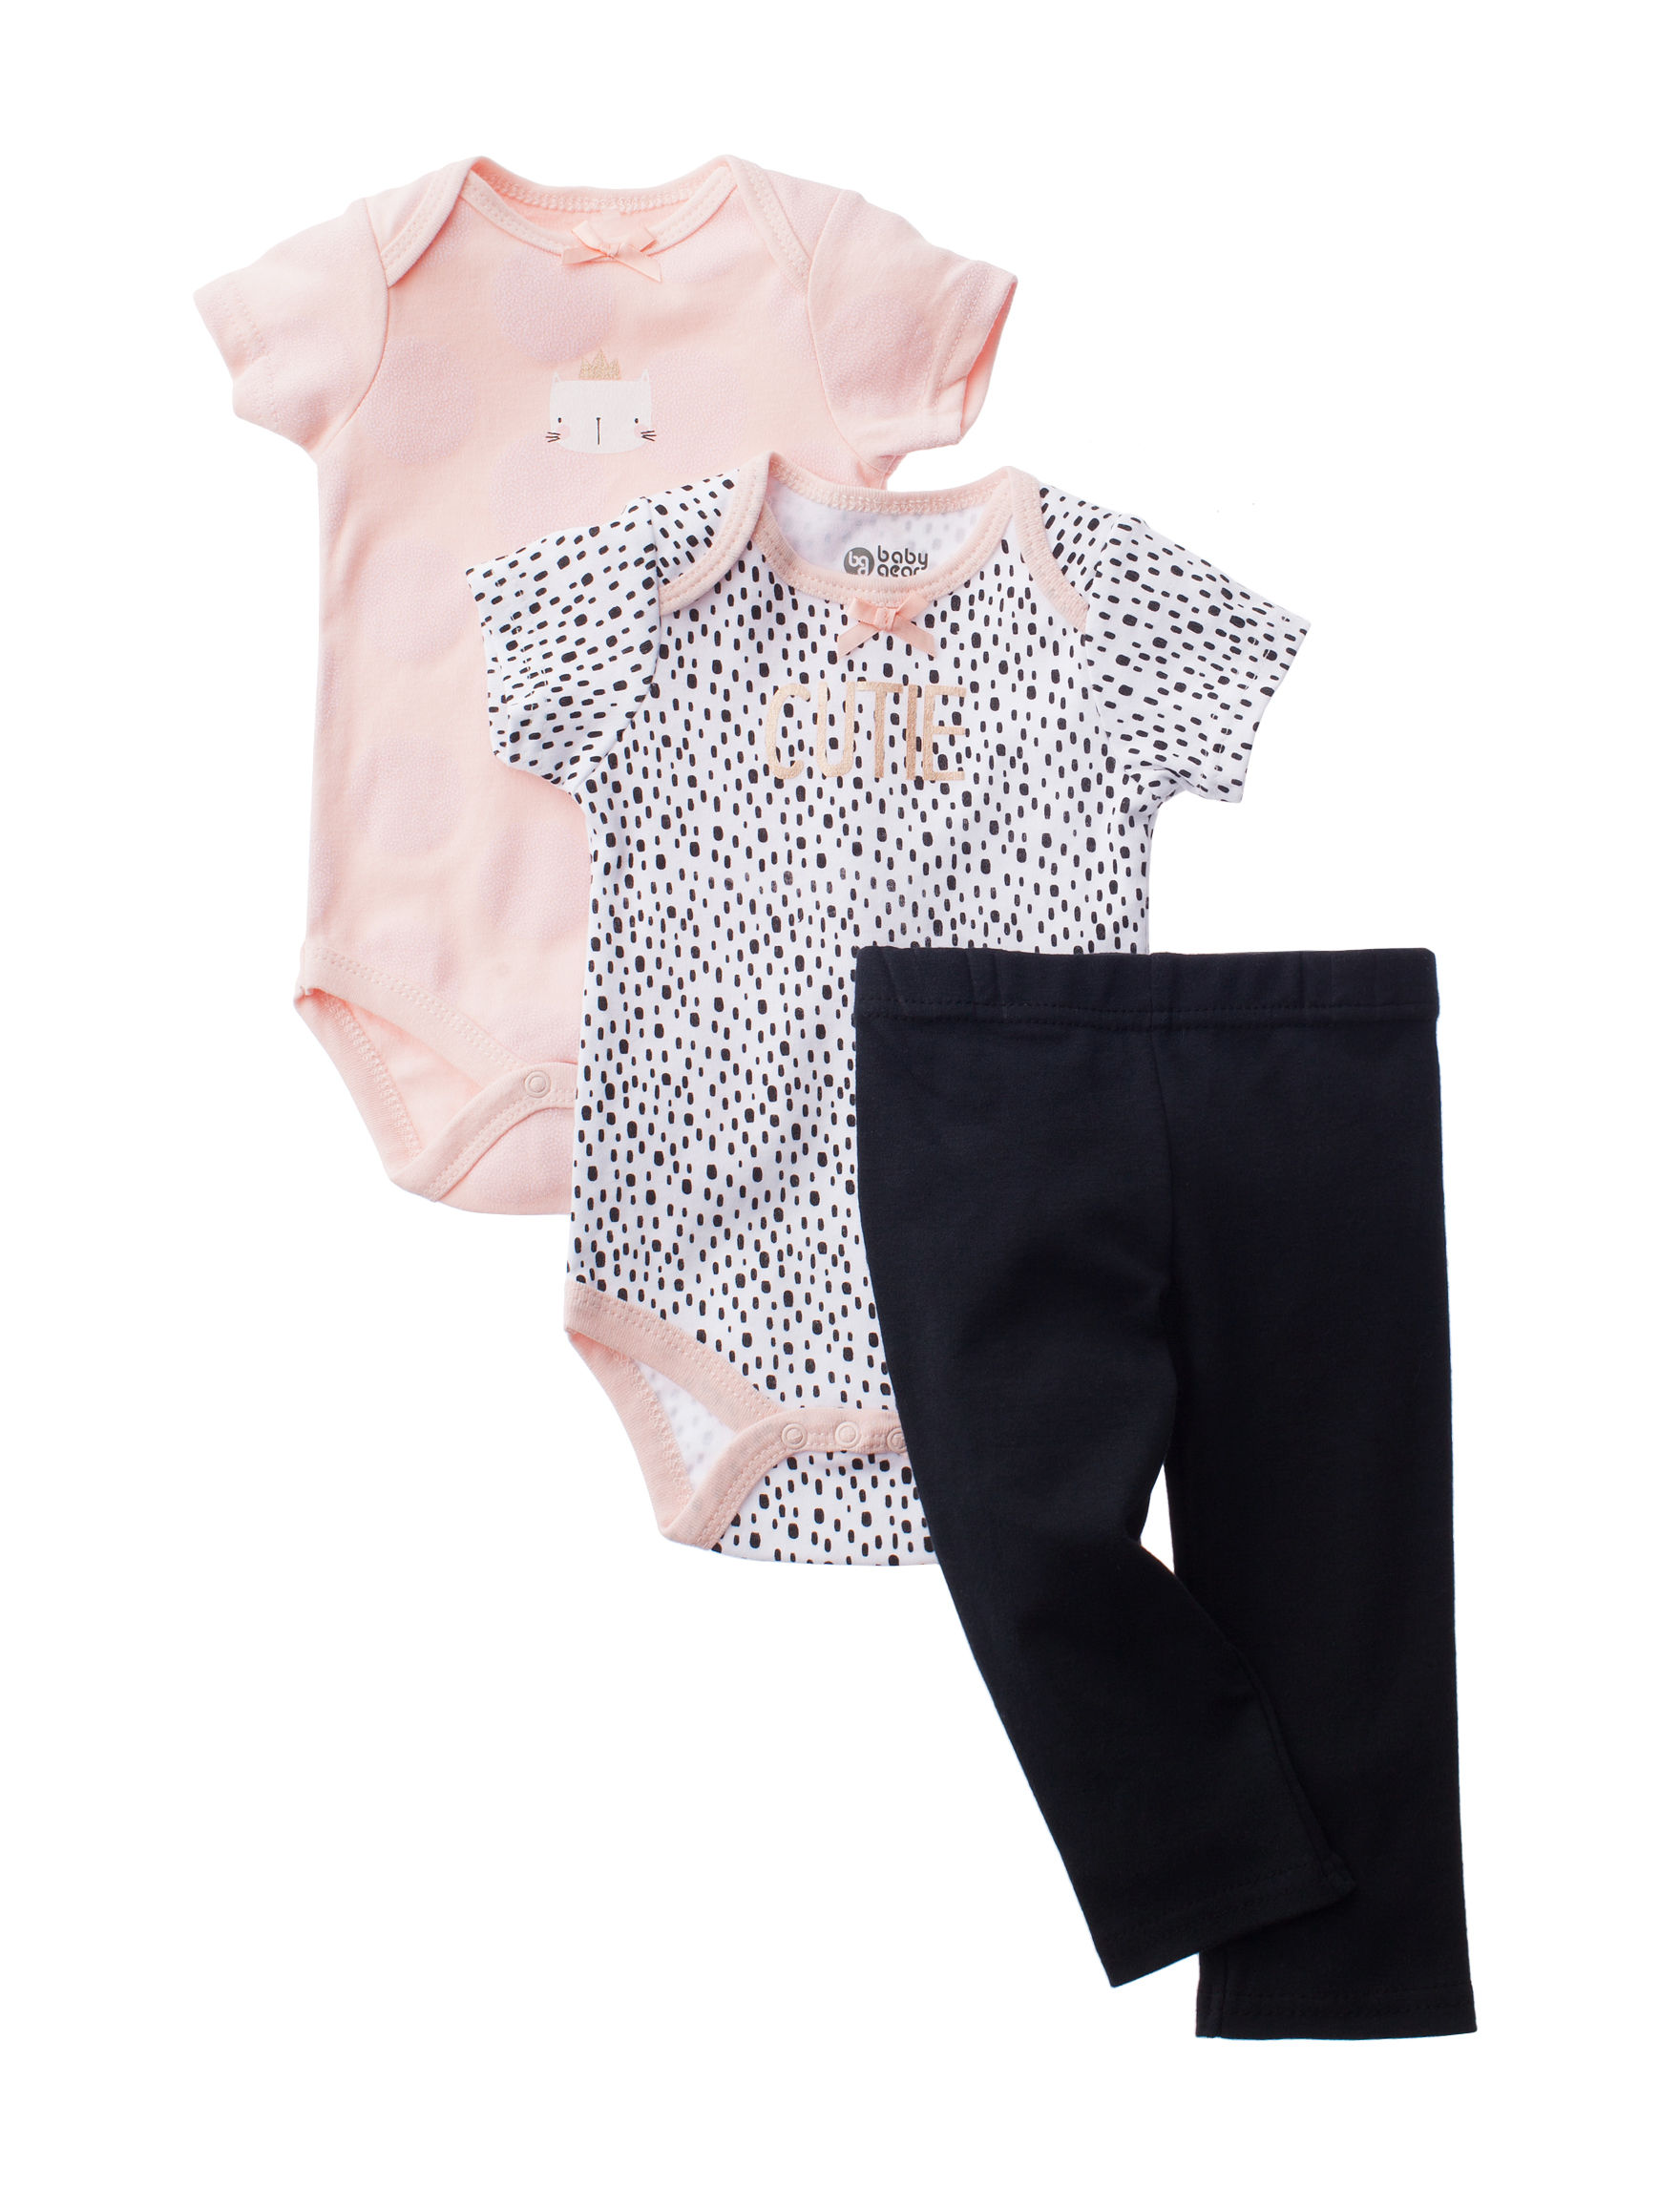 Baby Gear Pink / Black